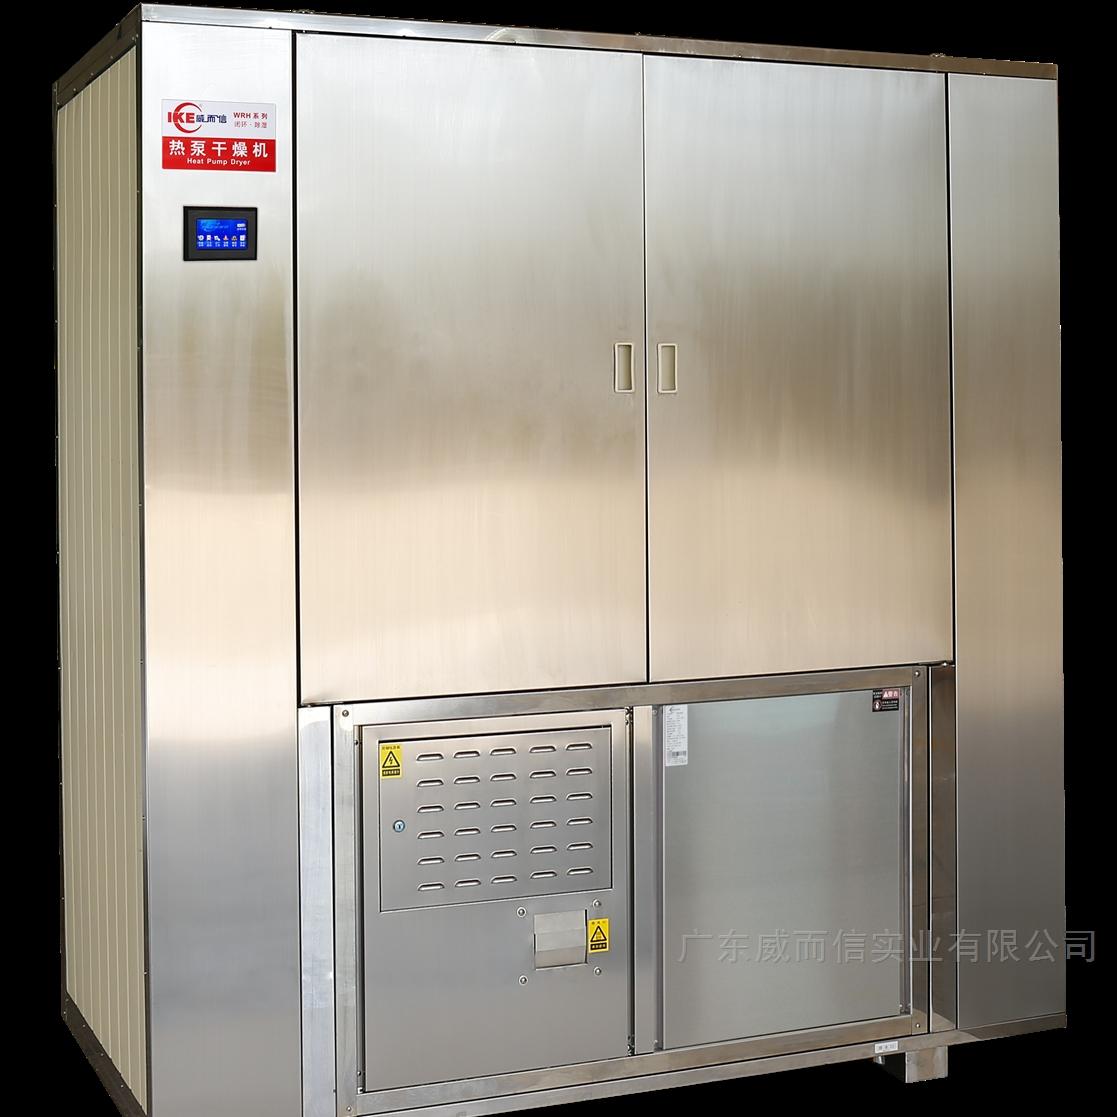 IKE威而信热泵干燥机